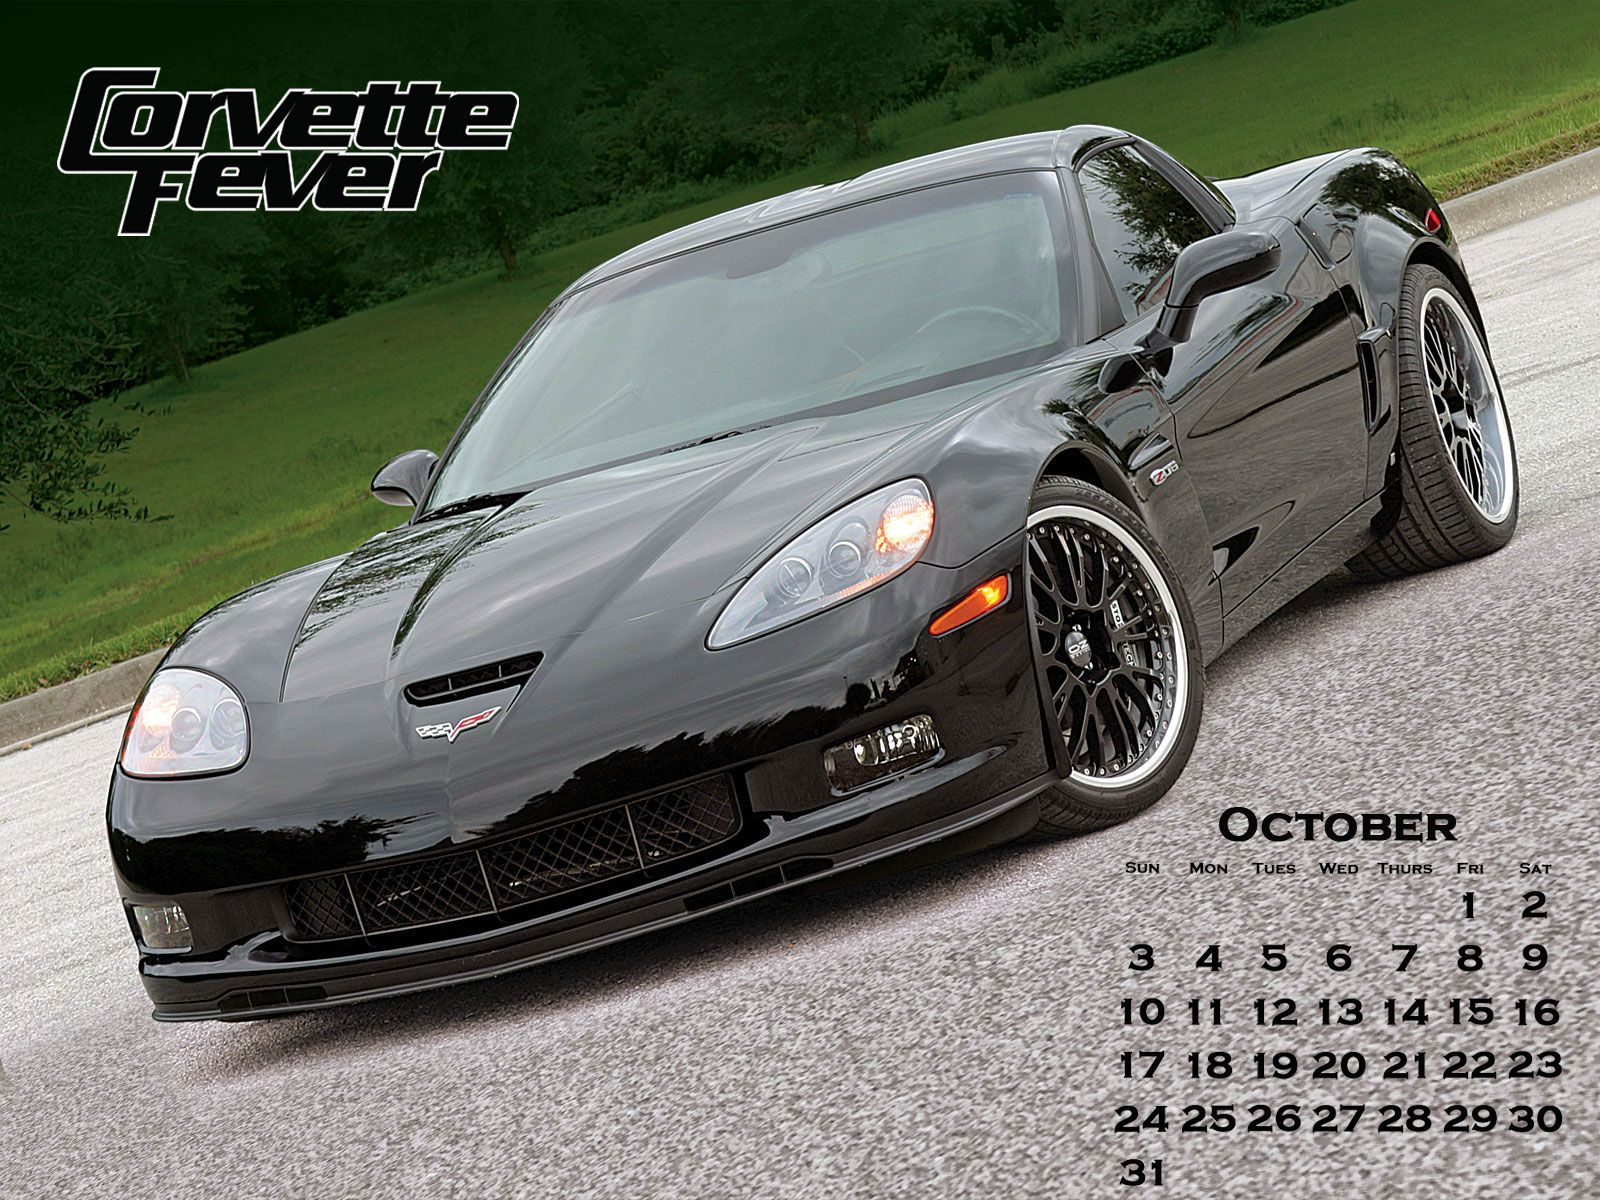 Thread Corvette Fevers 2010 October Calendar 1600x1200